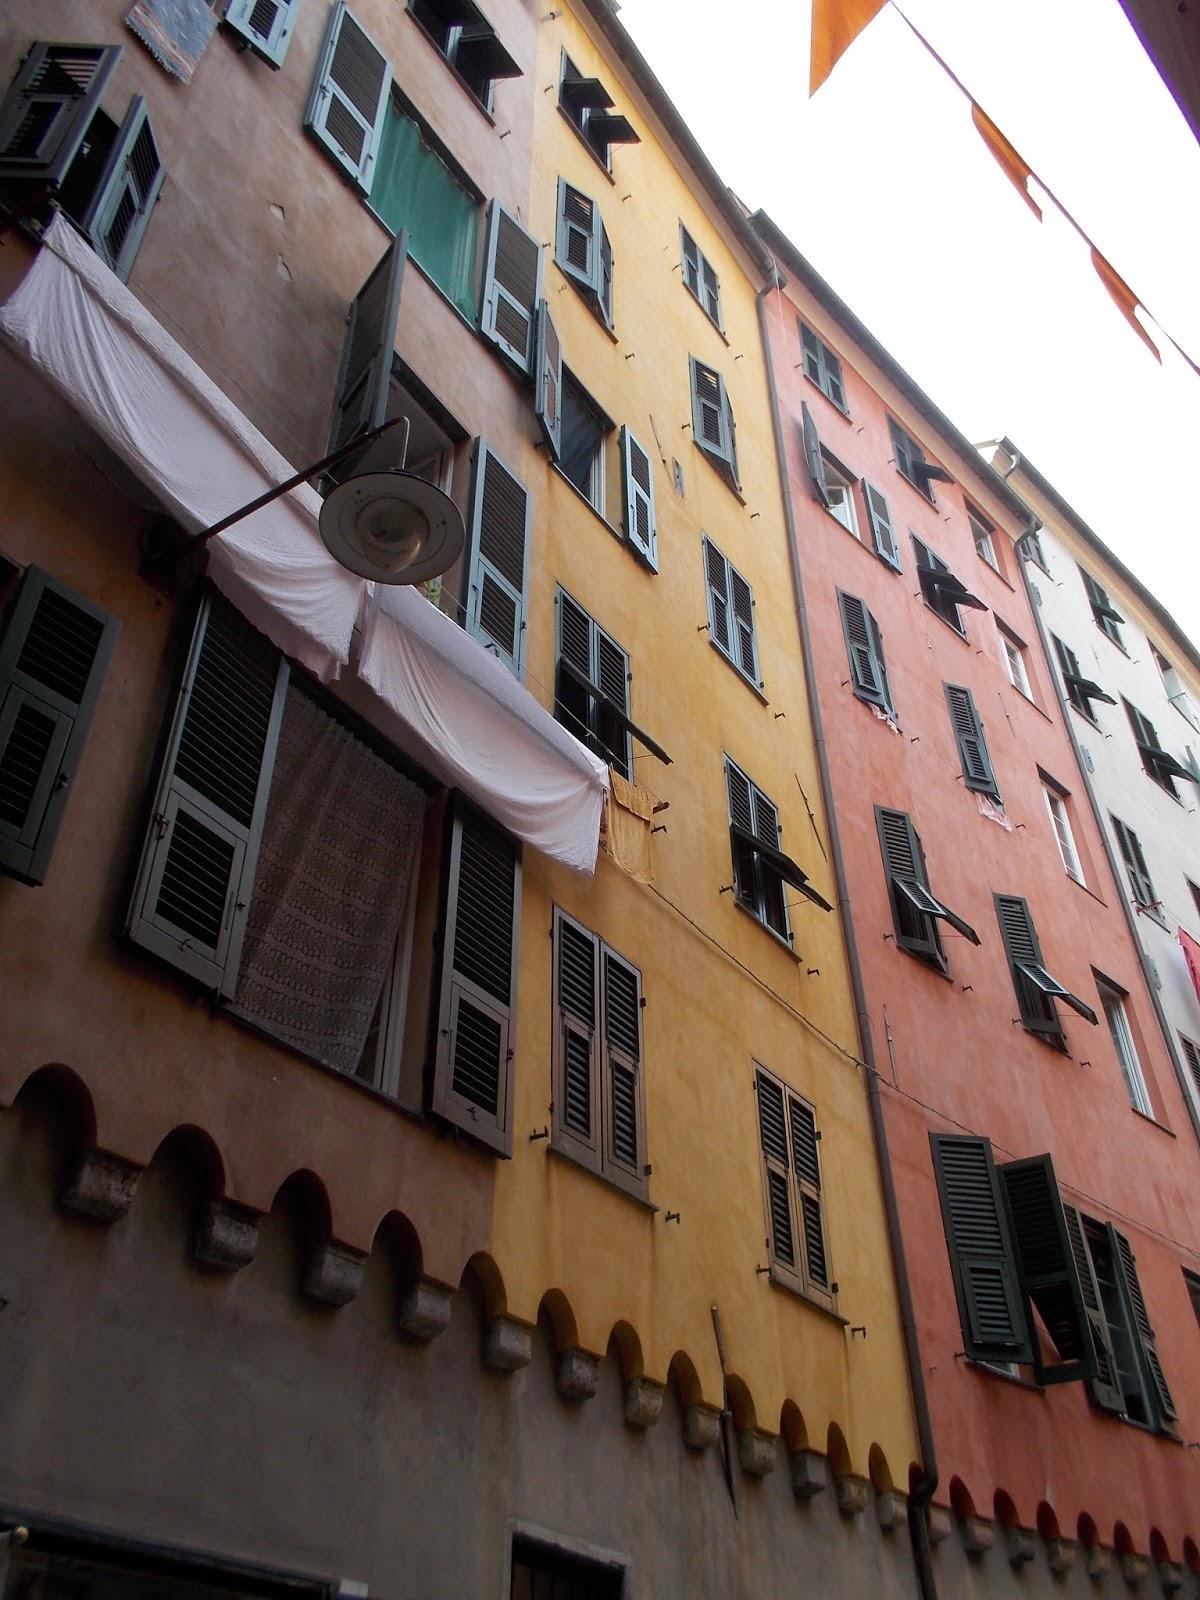 Genova geno n va l 39 orsa nel carro travel blog for Quattro ristoranti genova